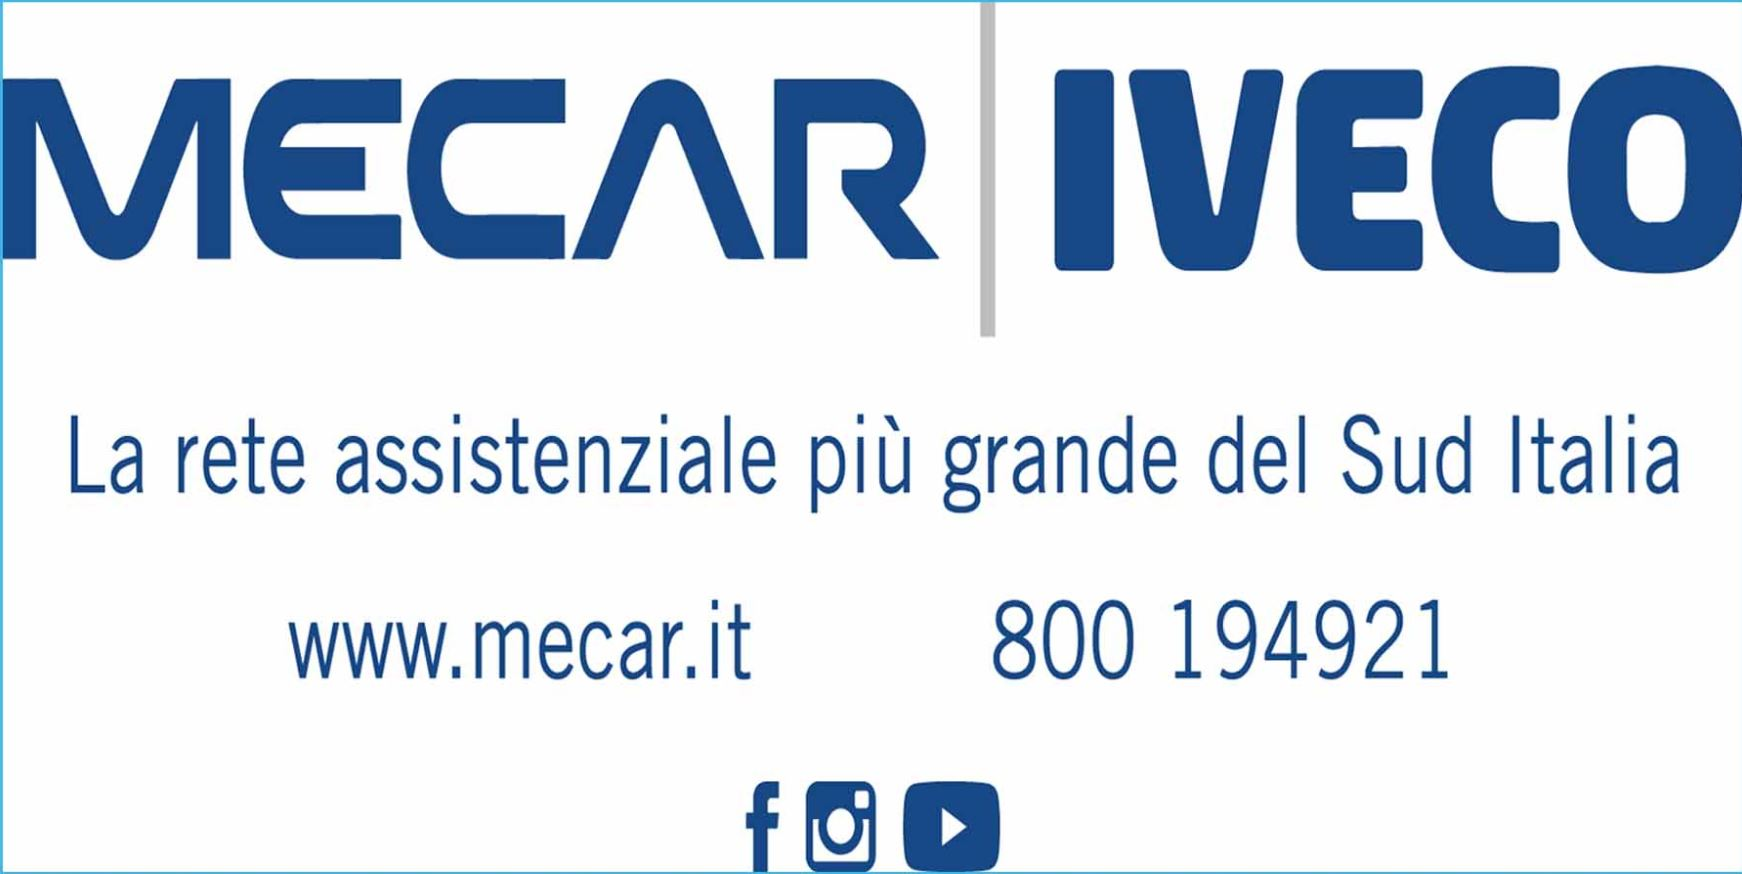 http://iniziativagimigliano.com/domain/wp-content/uploads/2018/07/Mecar.jpg